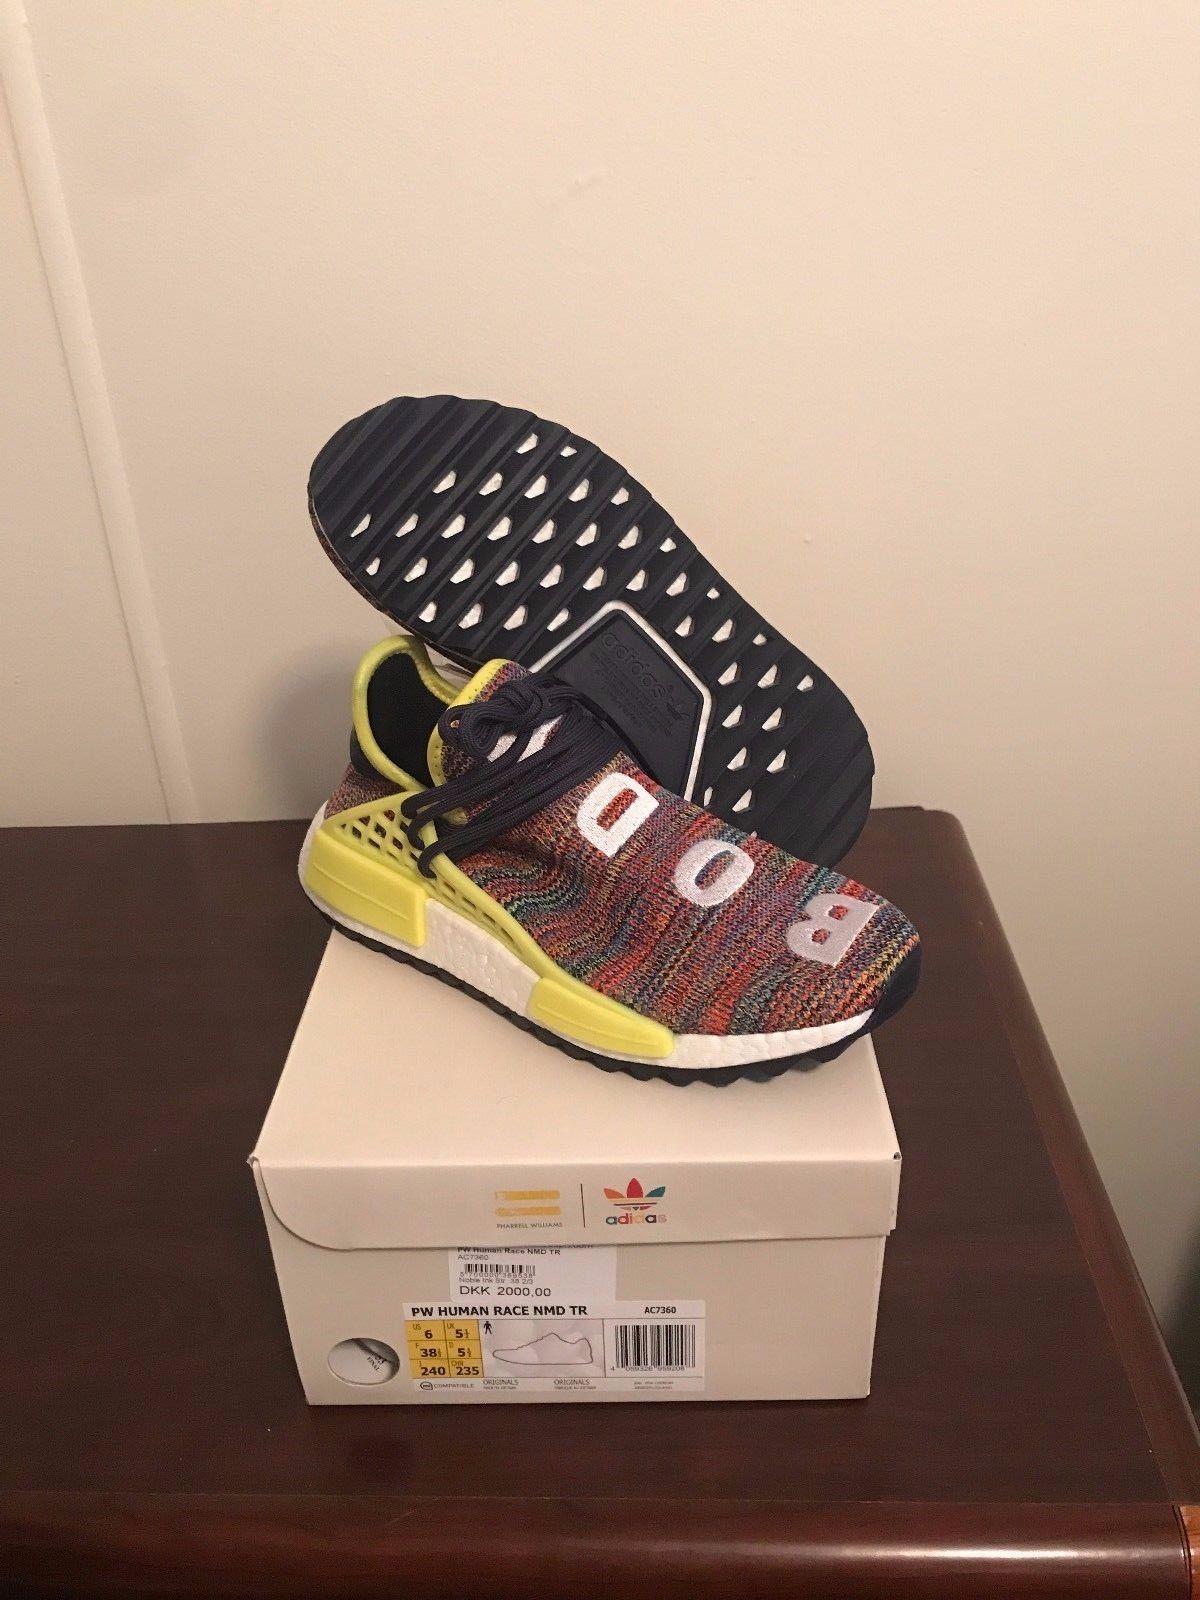 b870133a4606 Pharrell x Adidas NMD Human Race HU Trail   AC7360   Multi Color   Size 6